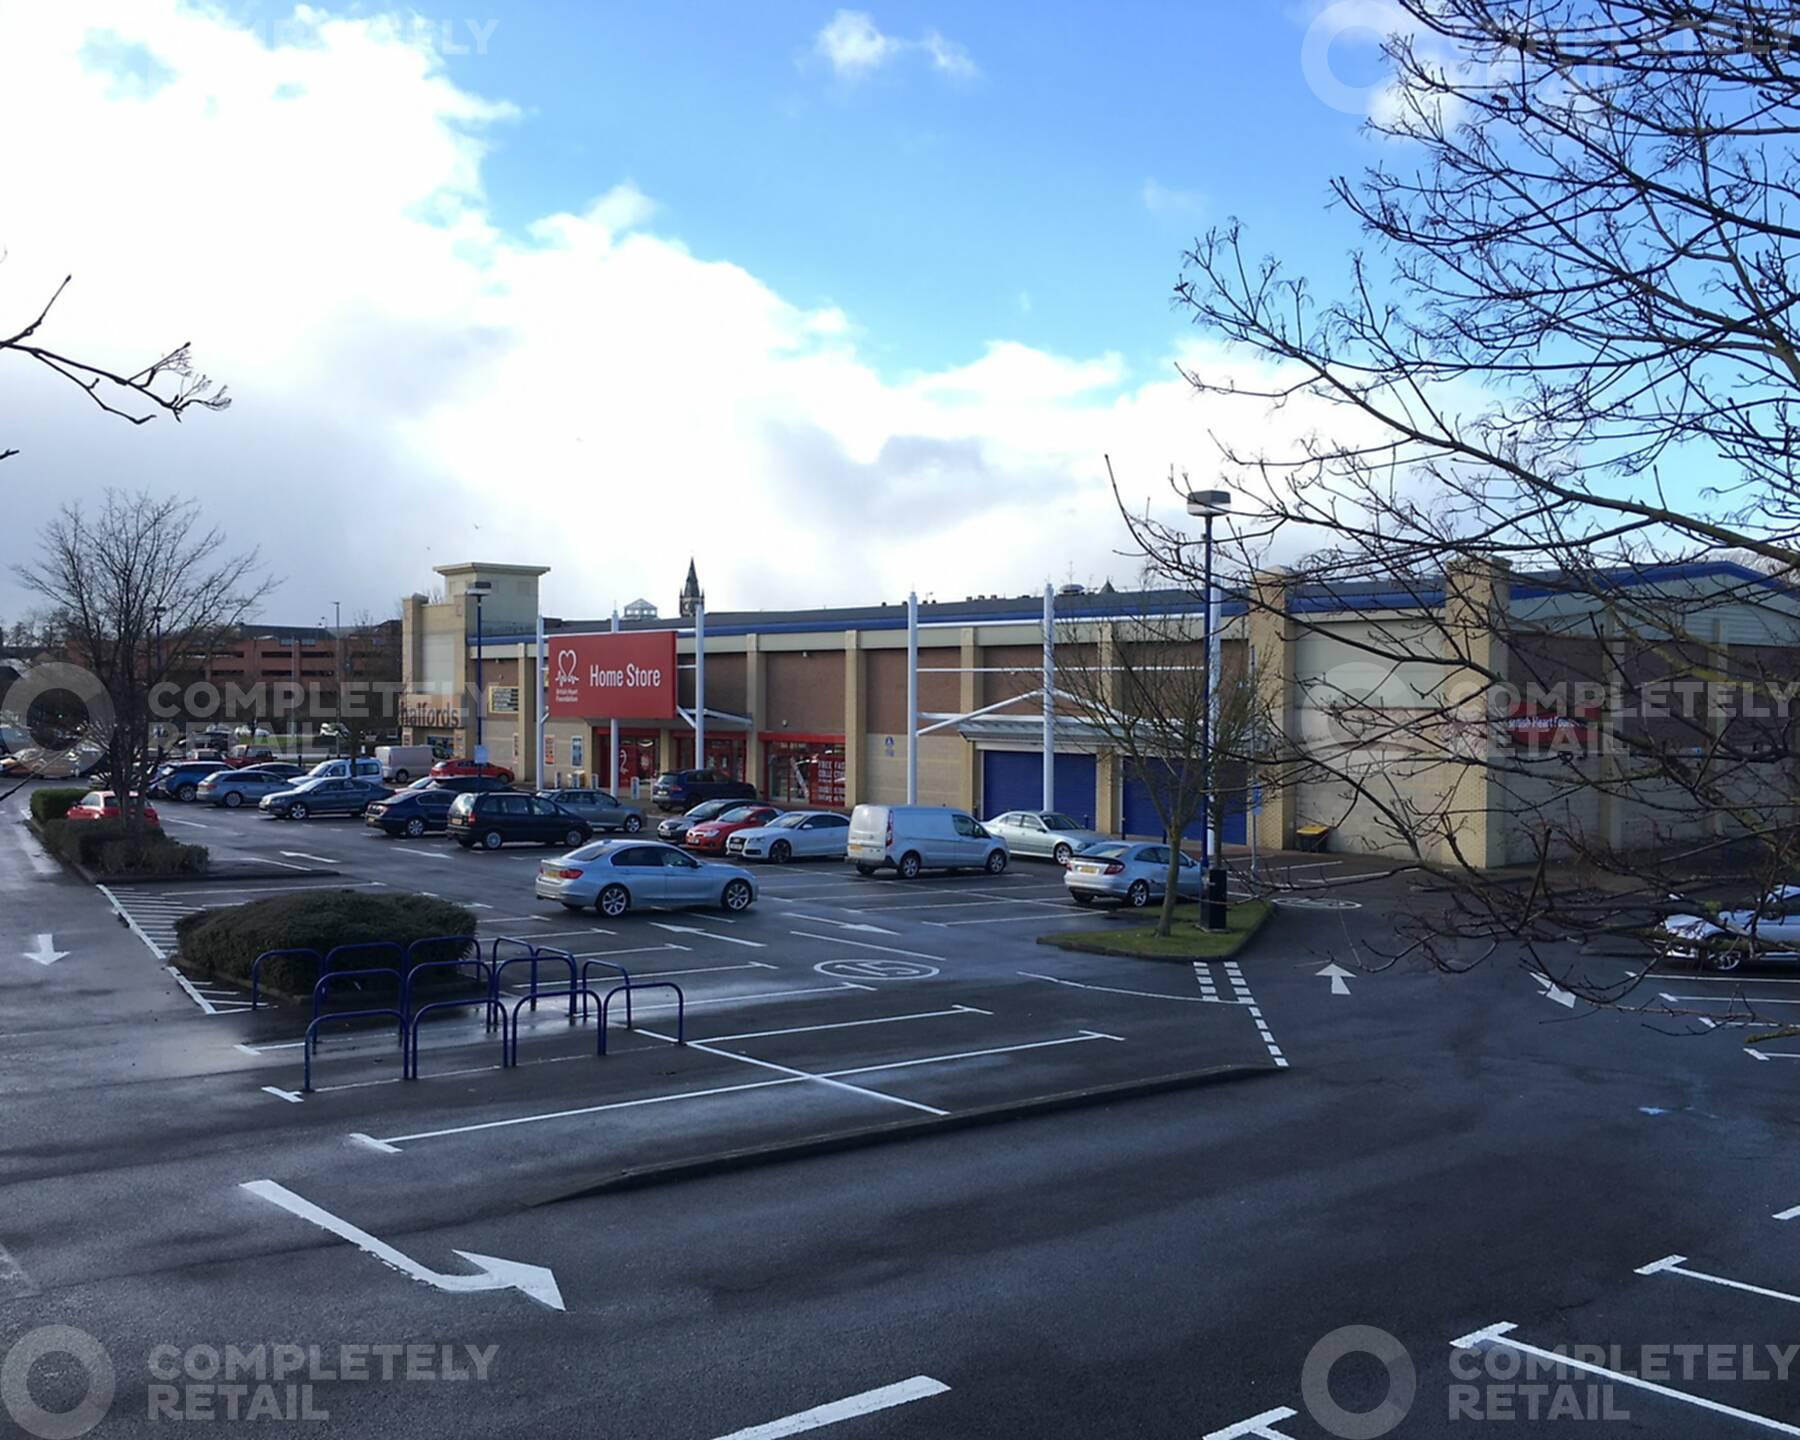 Russell Street Retail Park